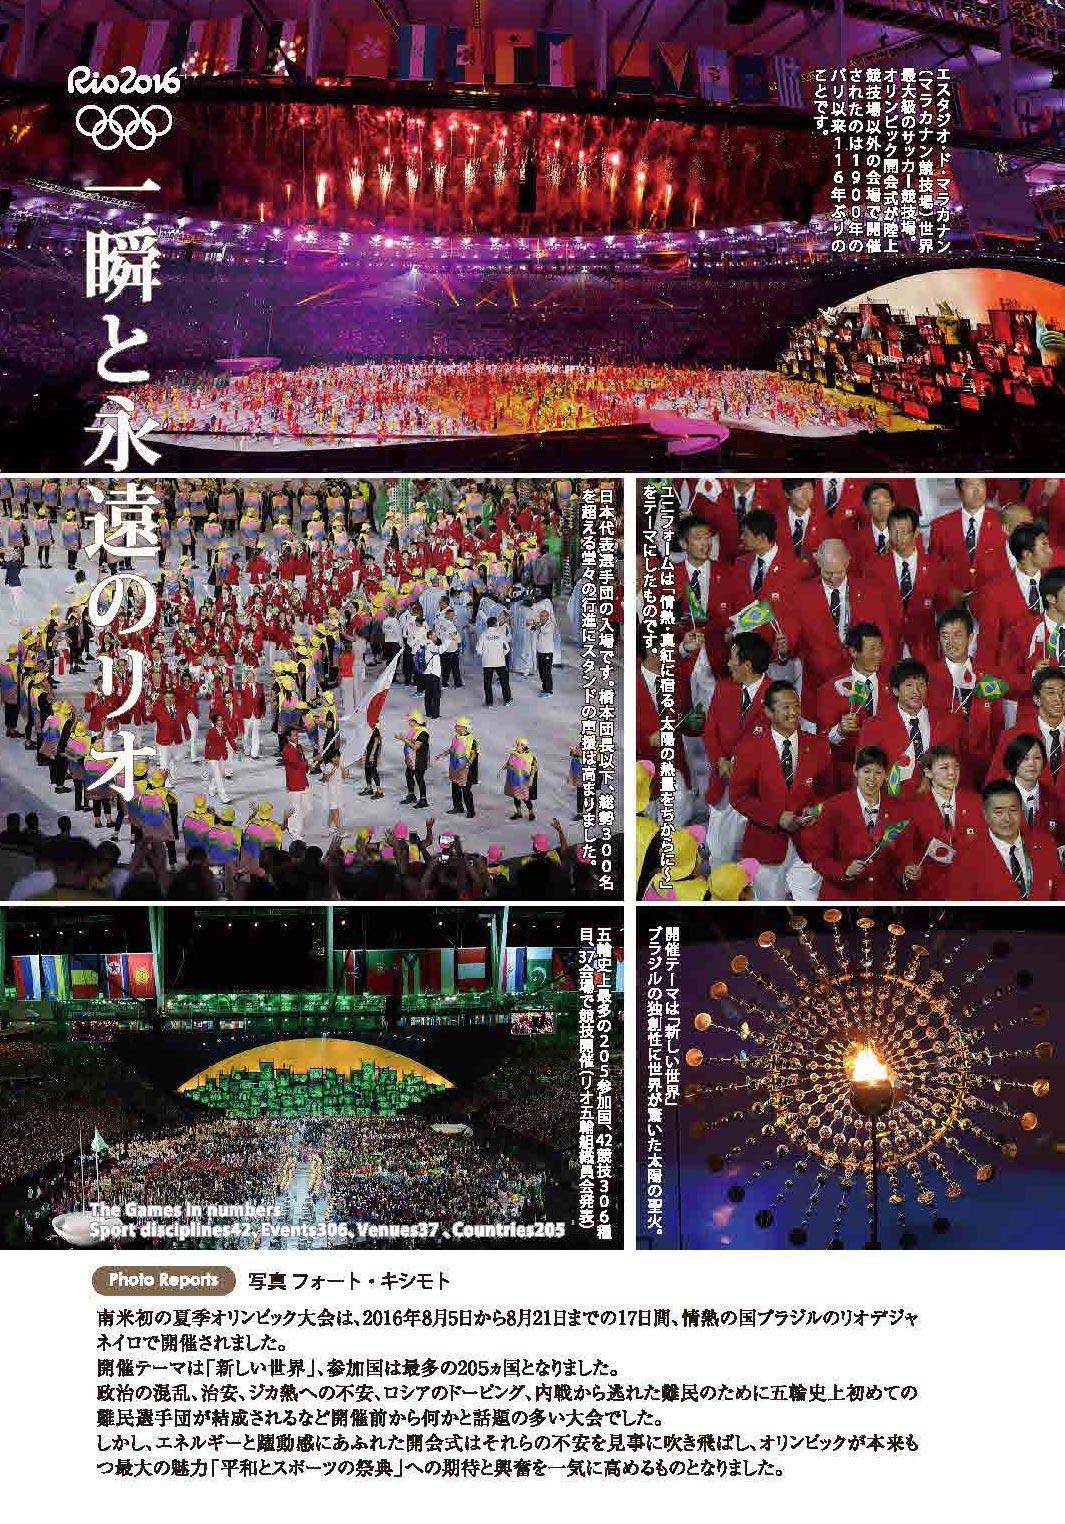 TOLだより第31号 Photo Reportsリオ2016….P1